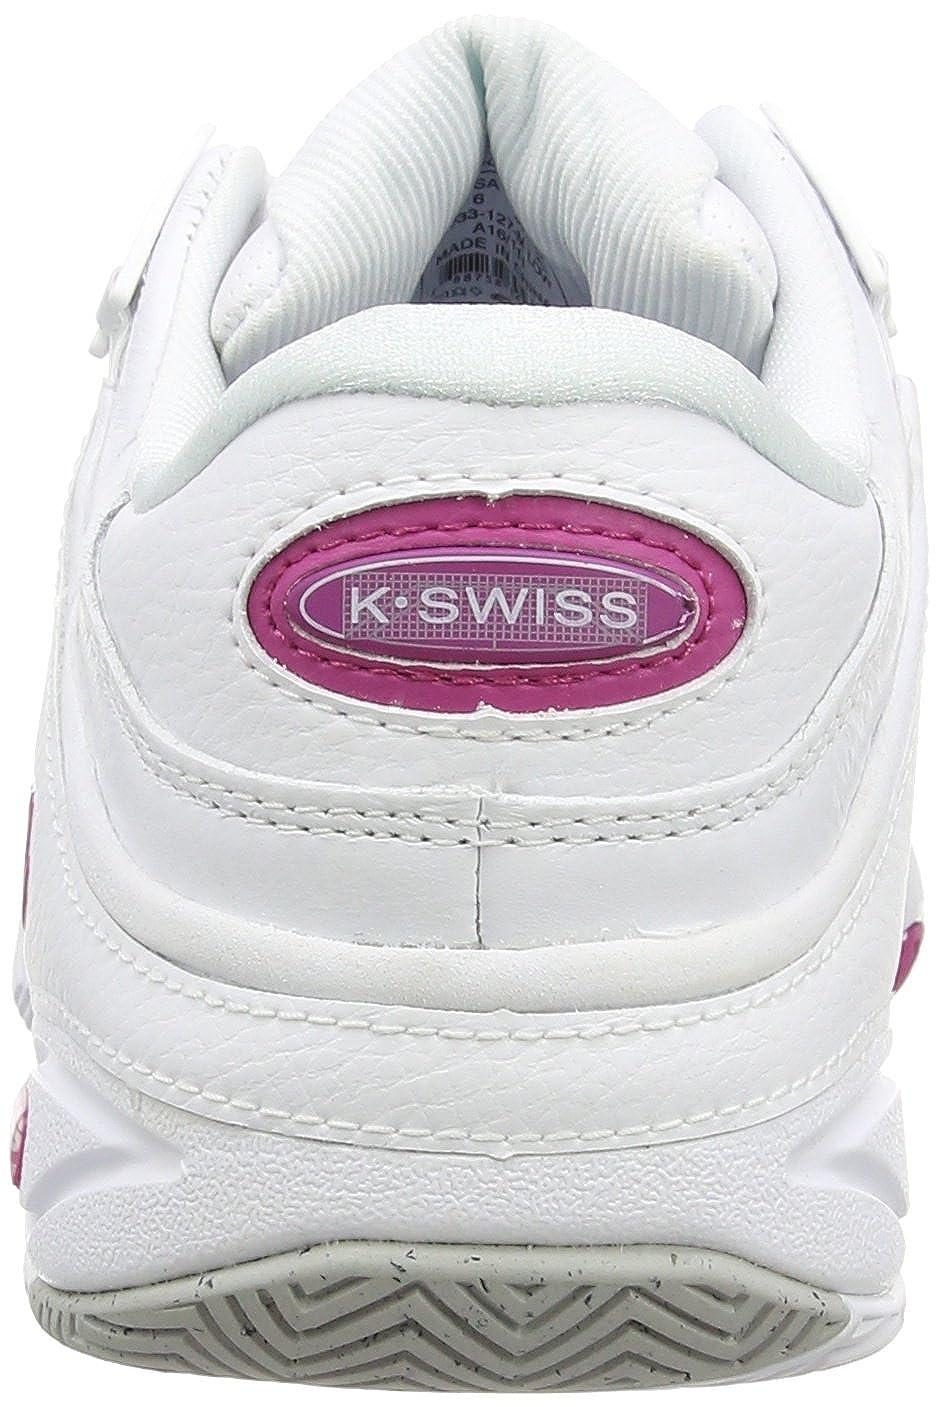 K-Swiss K-Swiss K-Swiss Performance Defier Rs, Damen Tennisschuhe  a06fad